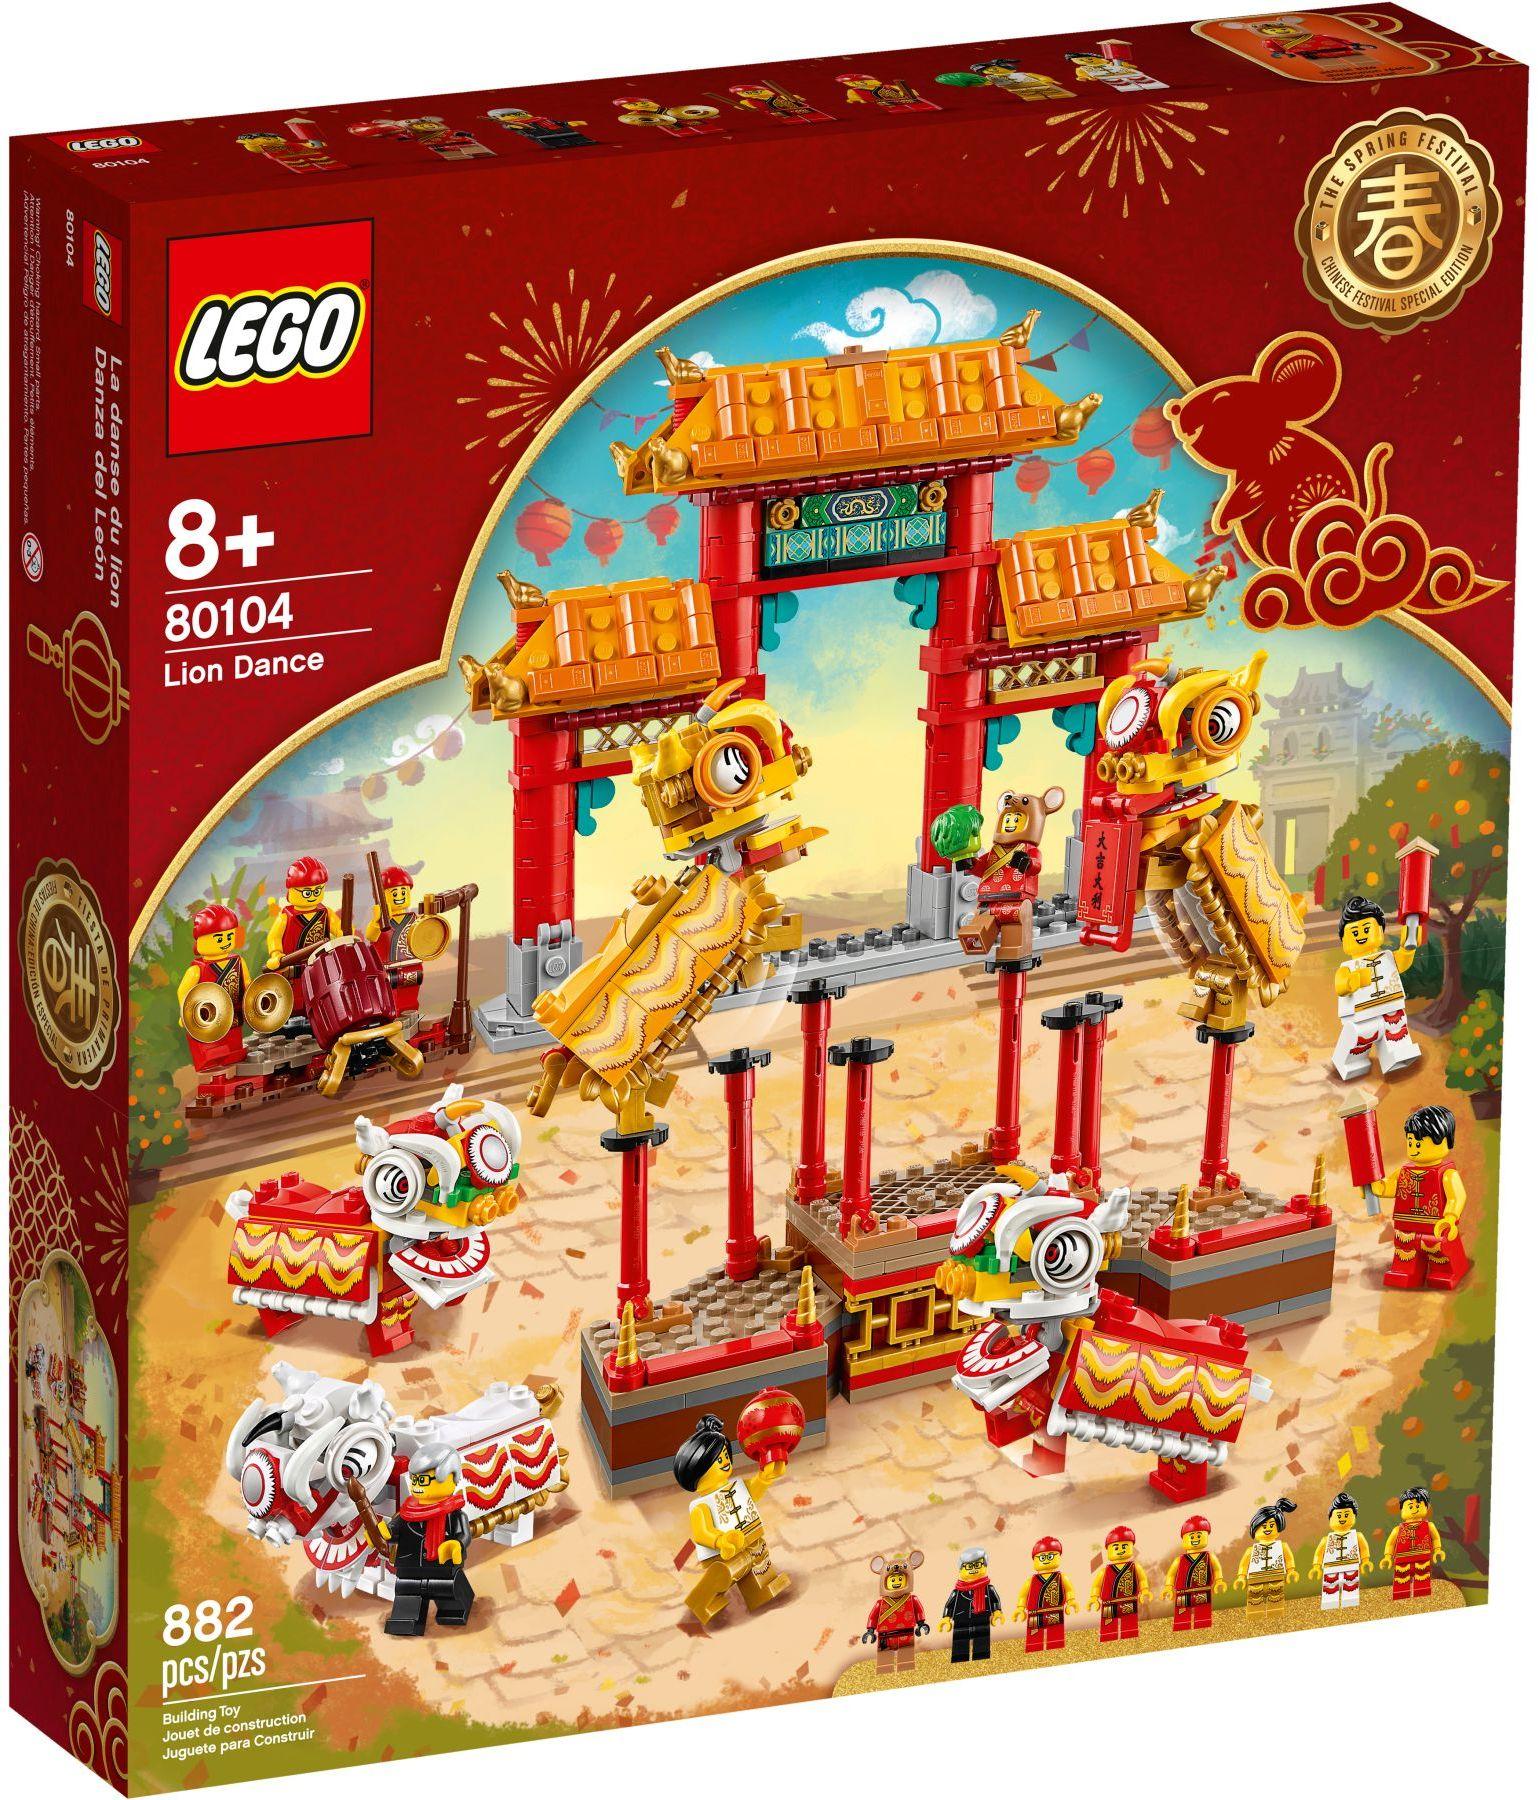 80104 LEGO Chinese Lion Dance - Múa Lân